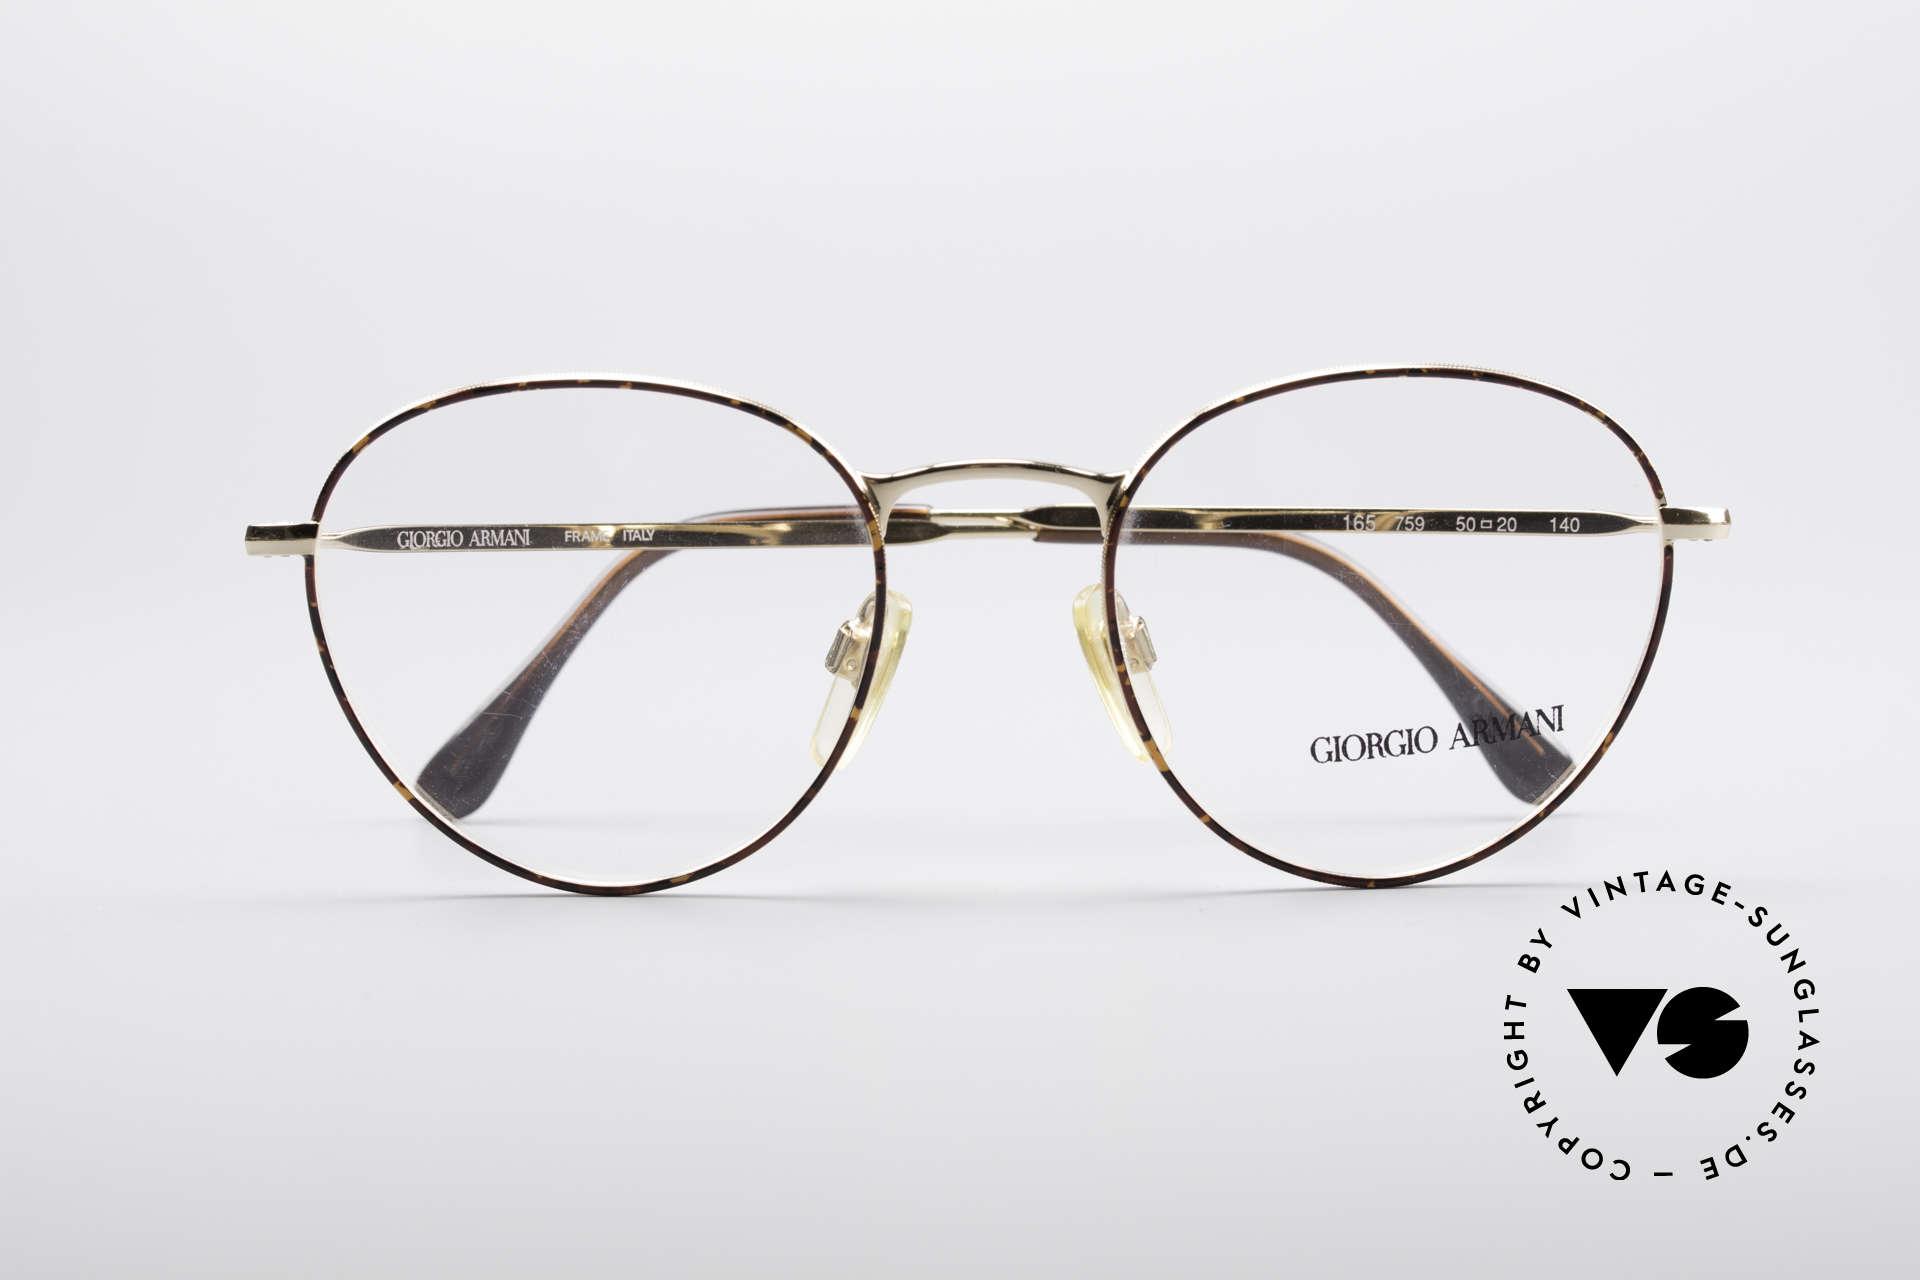 Giorgio Armani 165 Panto Vintage Glasses 80s 90s, NO retro specs, but a unique 30 years old ORIGINAL!, Made for Men